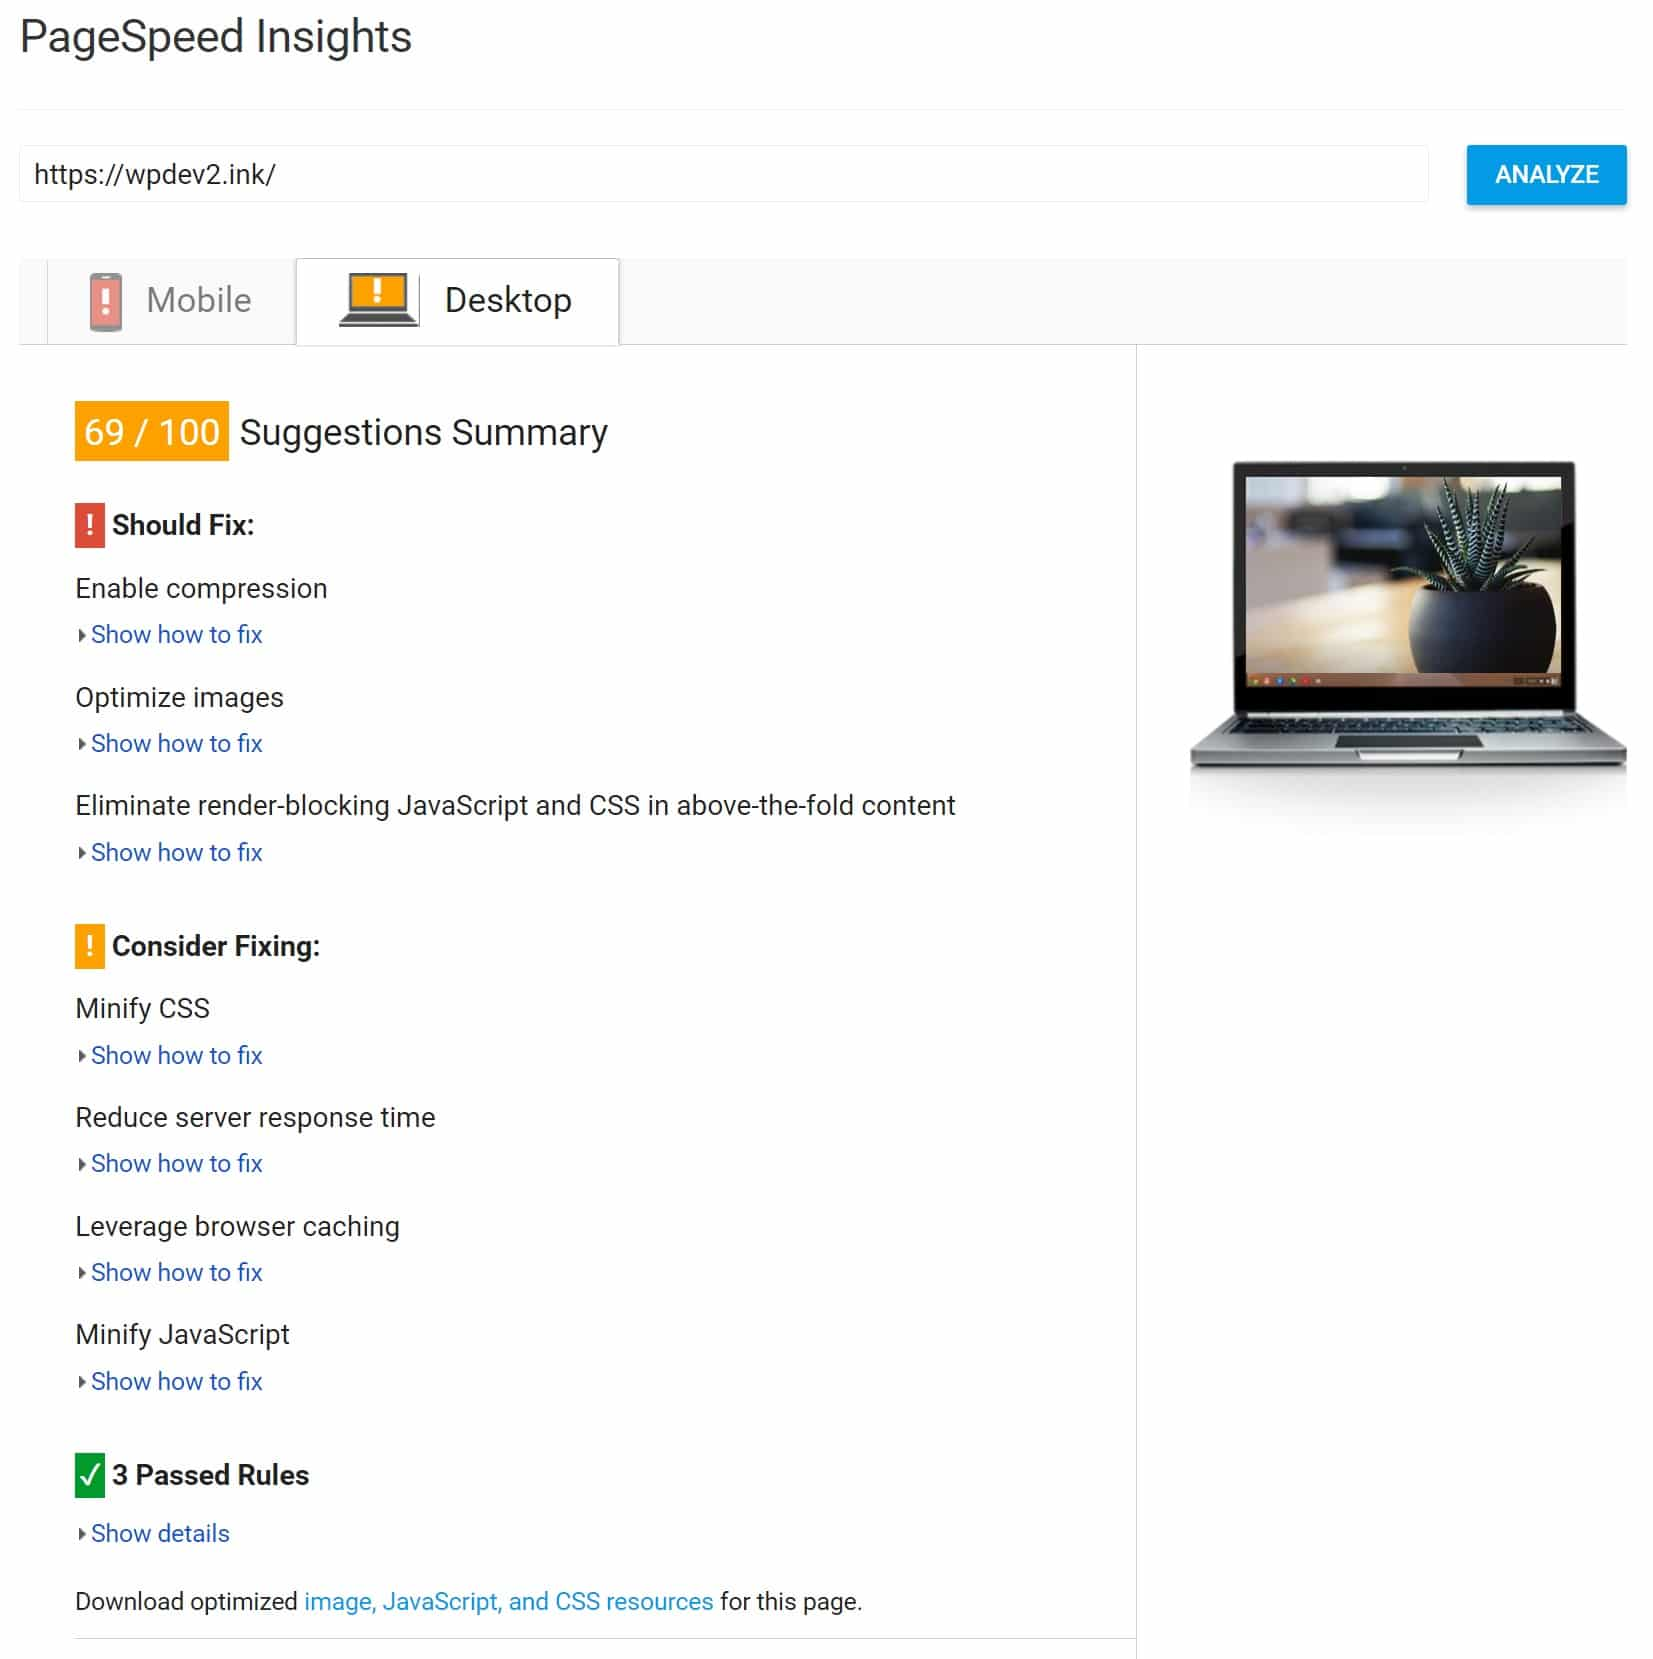 Score d'hébergement mutualisé sur Google PageSpeed Insights